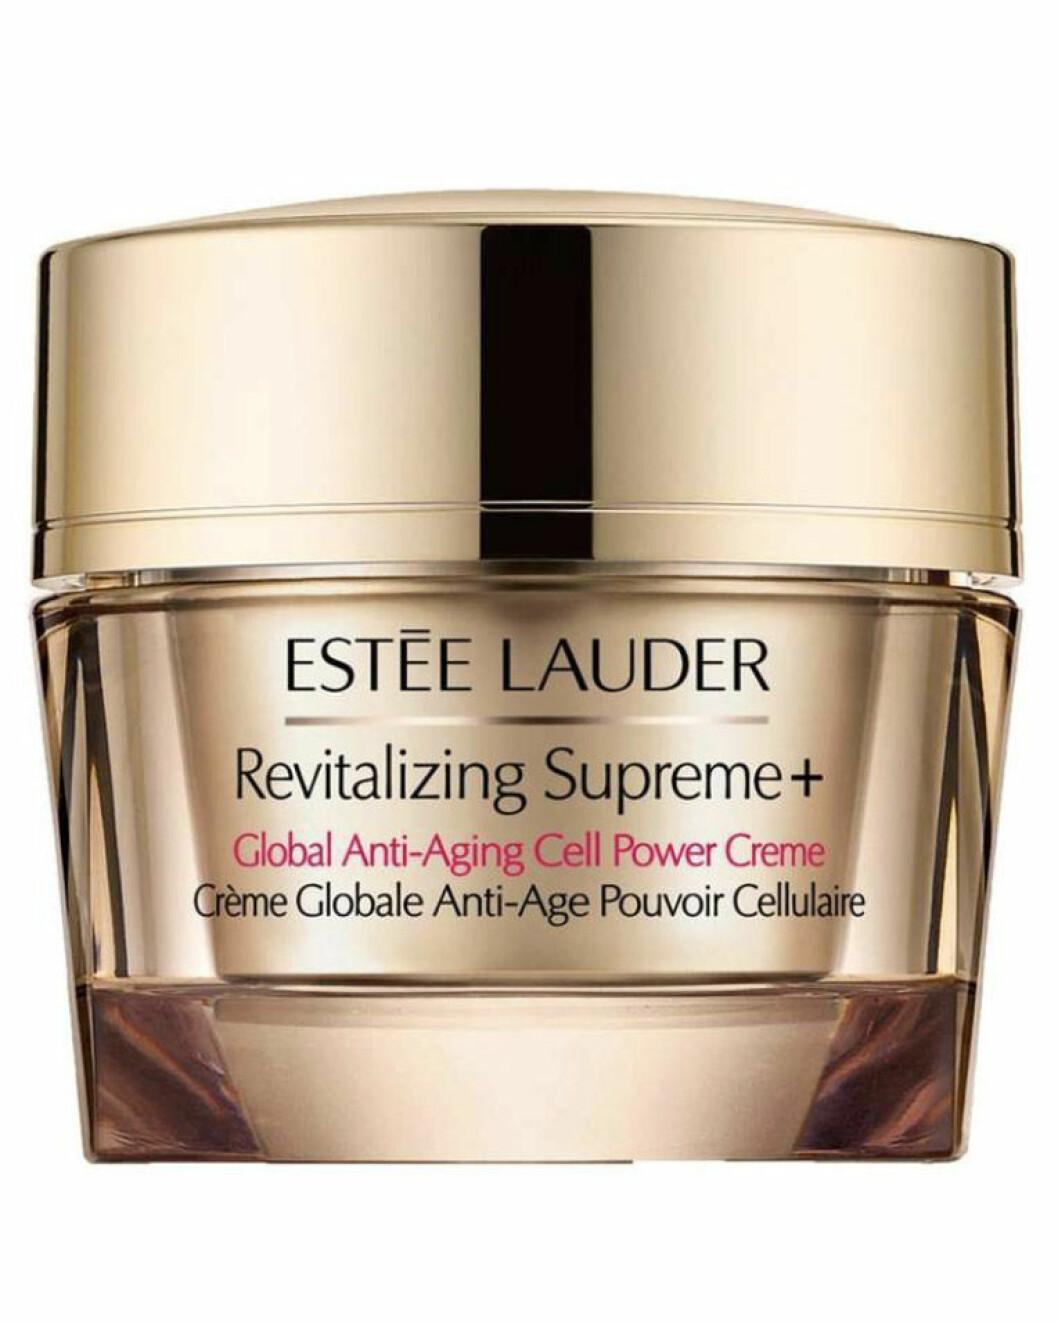 Med oppstrammende planteoljer  (kr 900, Estée Lauder, Revitalizing Supreme Plus Global Anti-Aging Cell Power Creme).